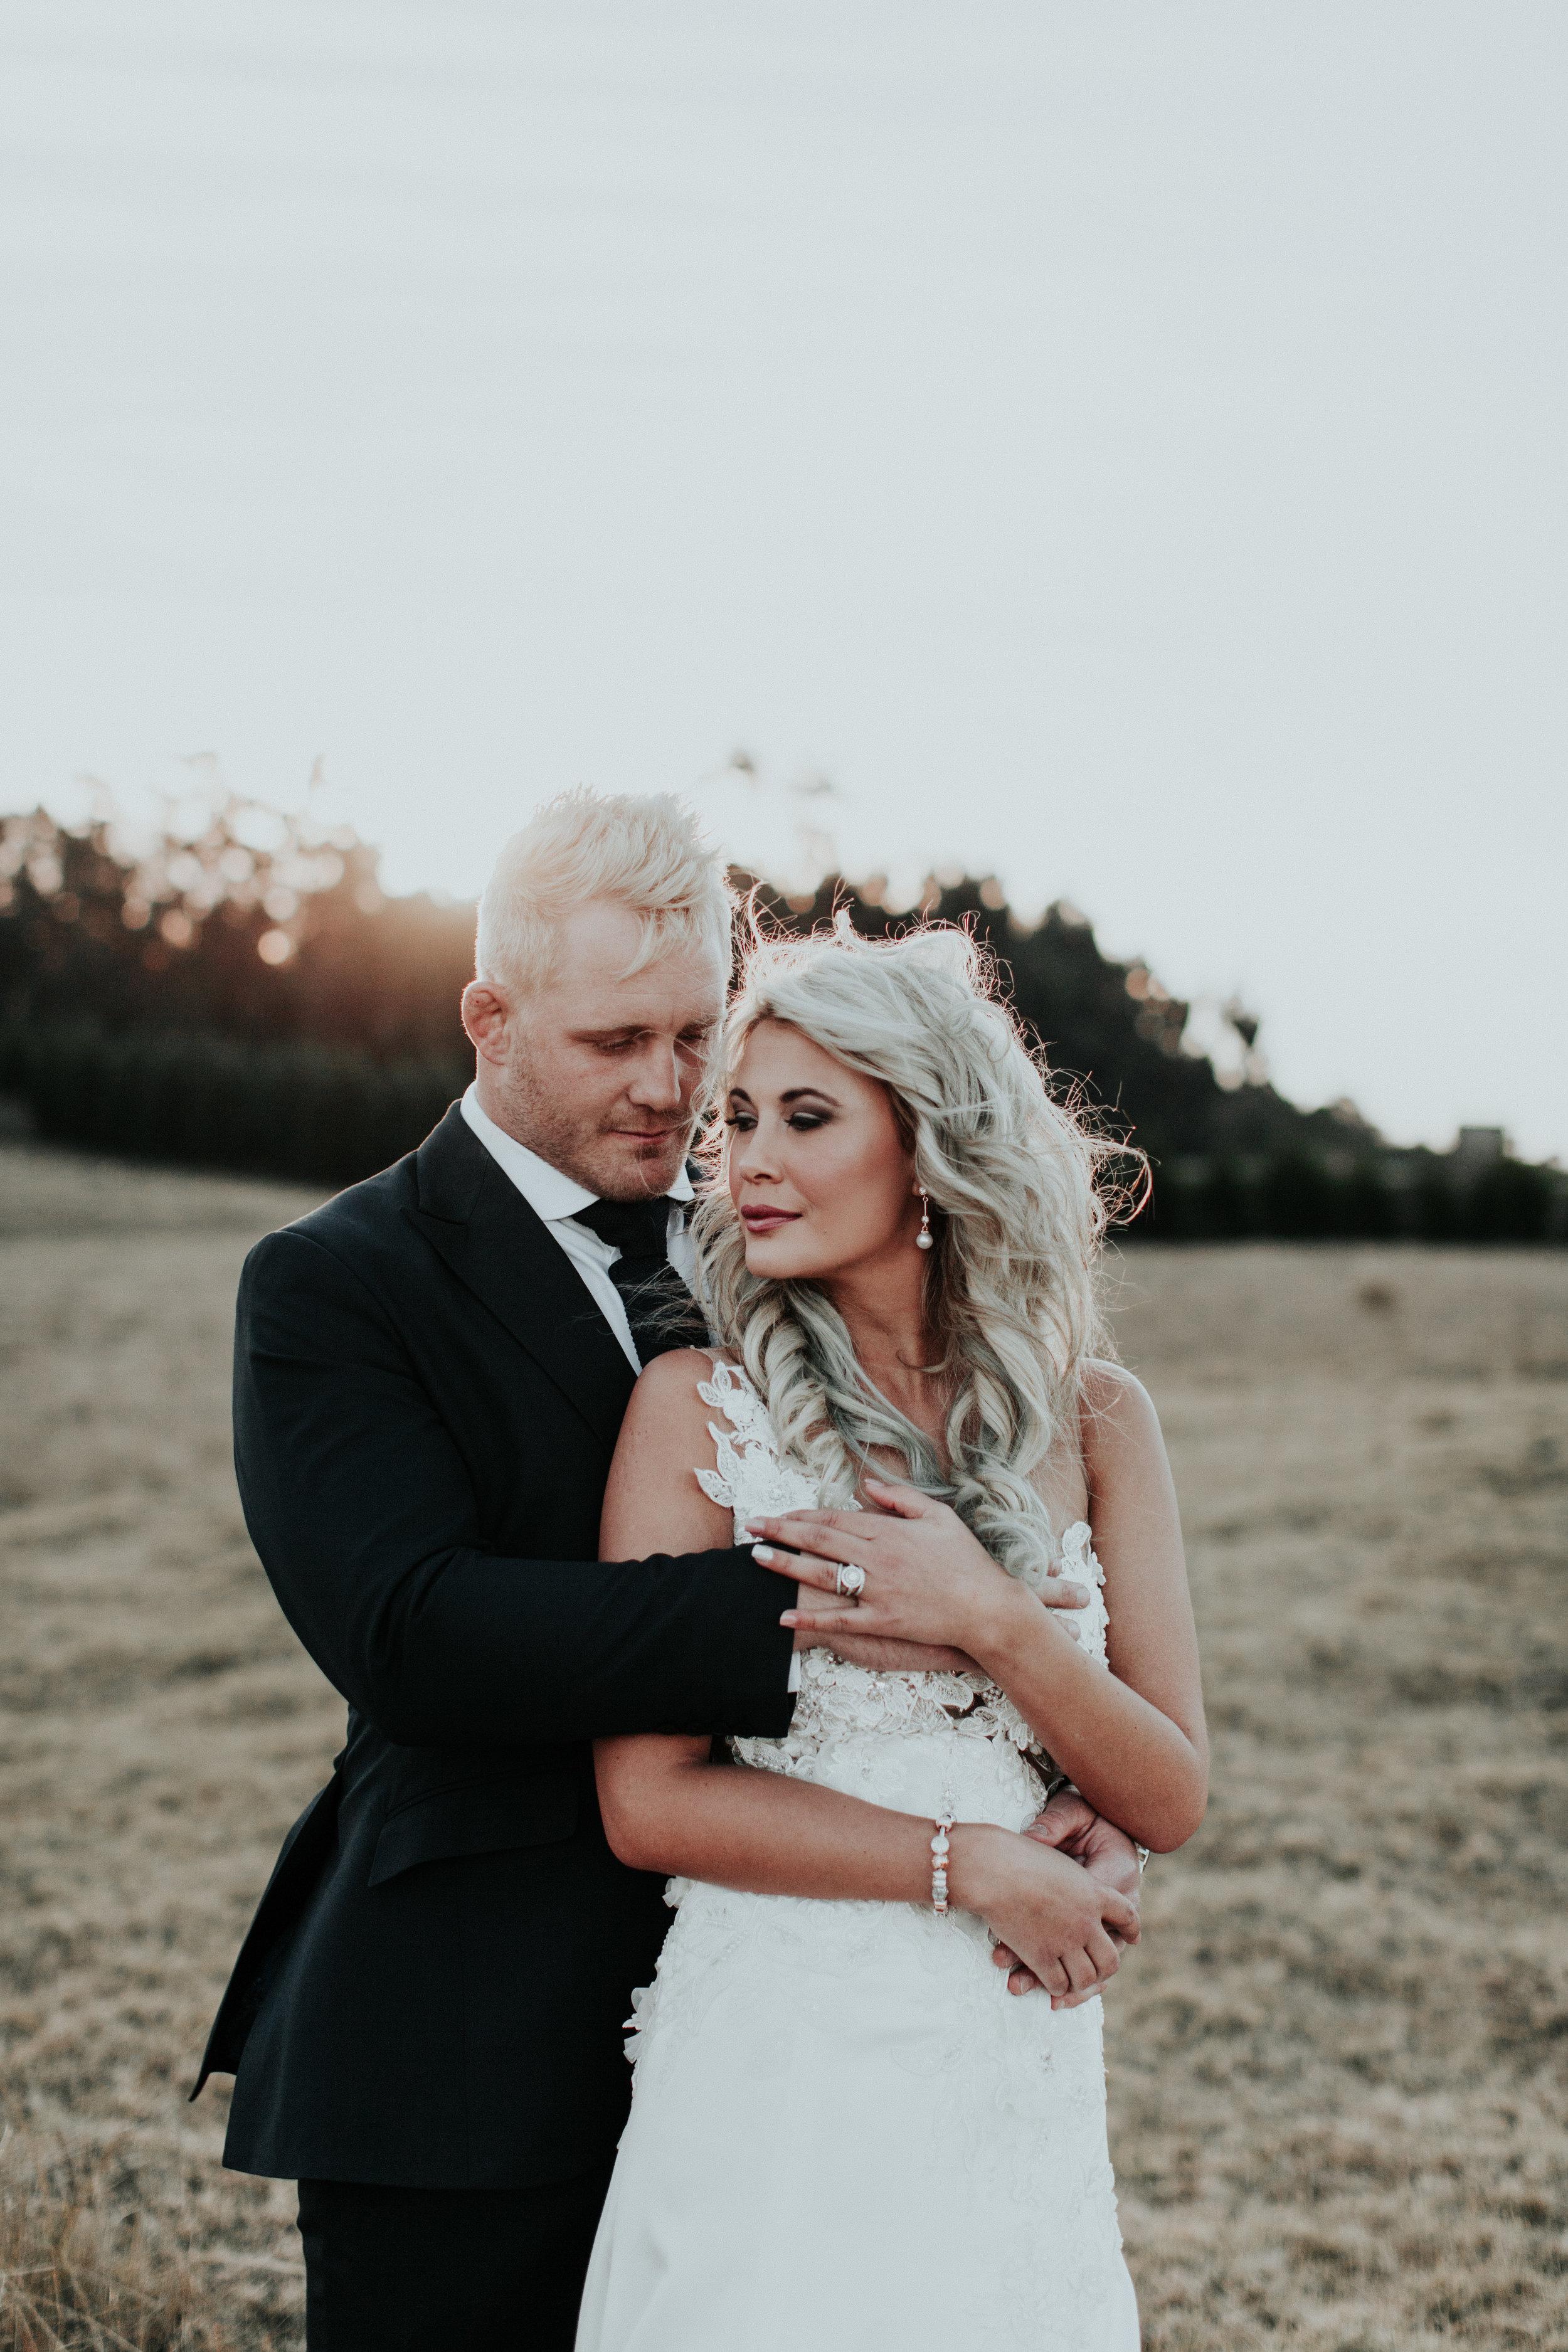 Kristi Smith Photography_Vincent&Jandre_ Wedding Photographer 18.jpg